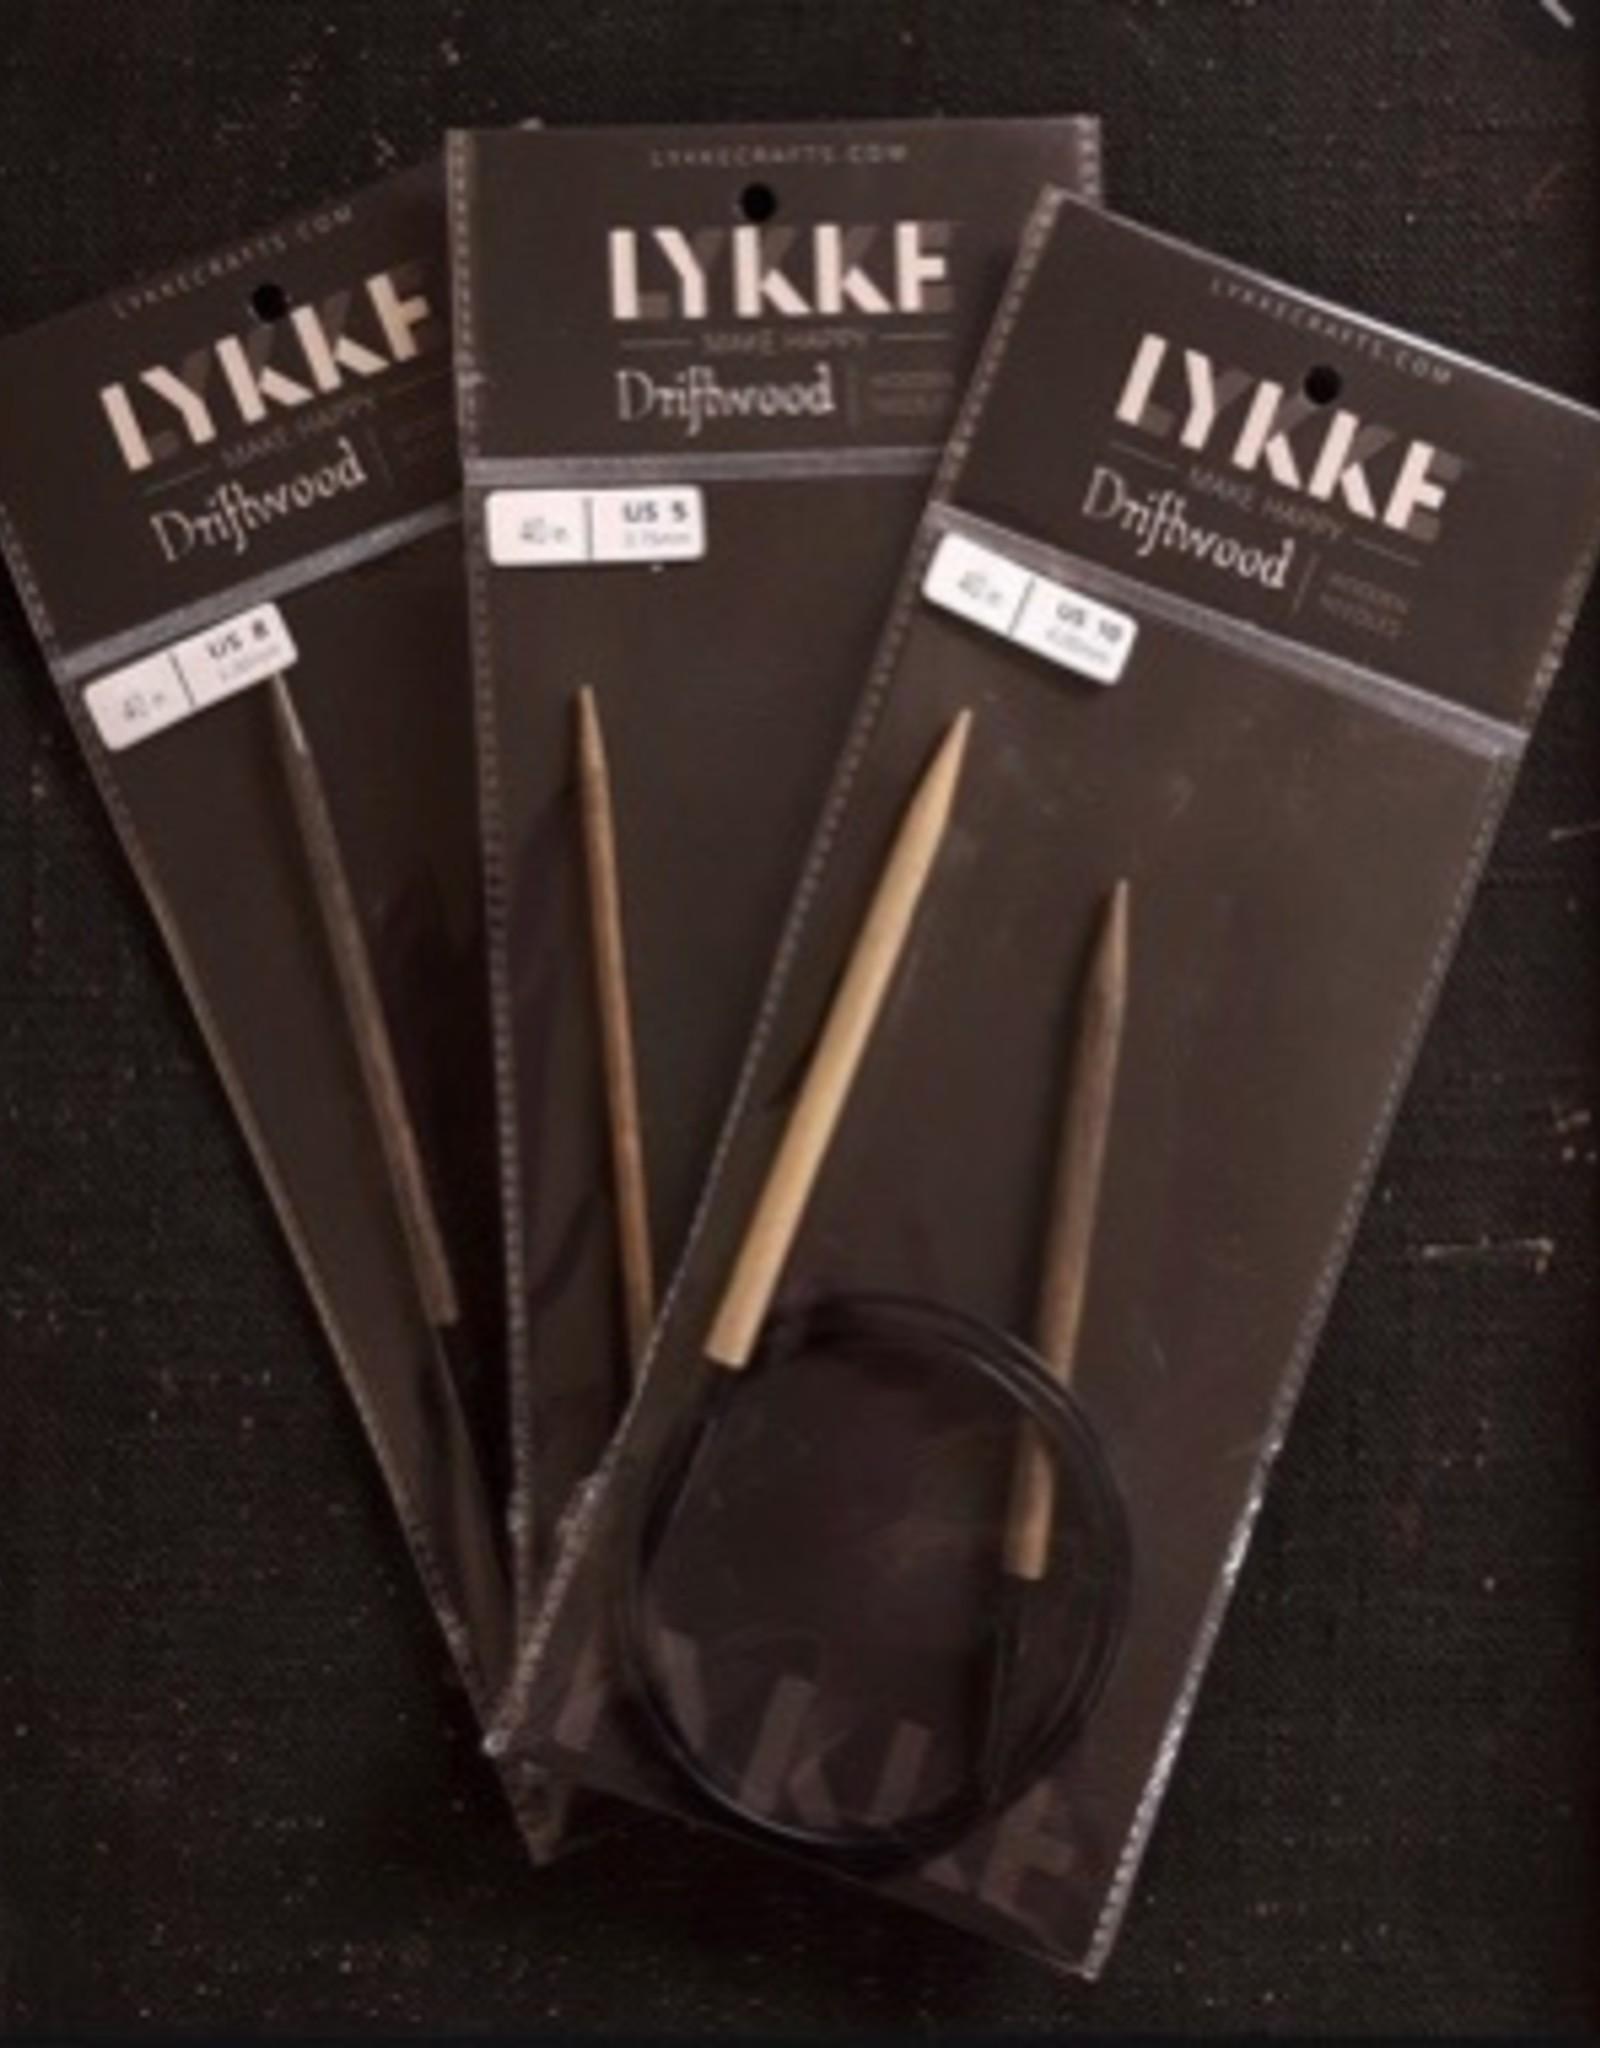 "Lykke Lykke Driftwood 40"" Circular Needles"